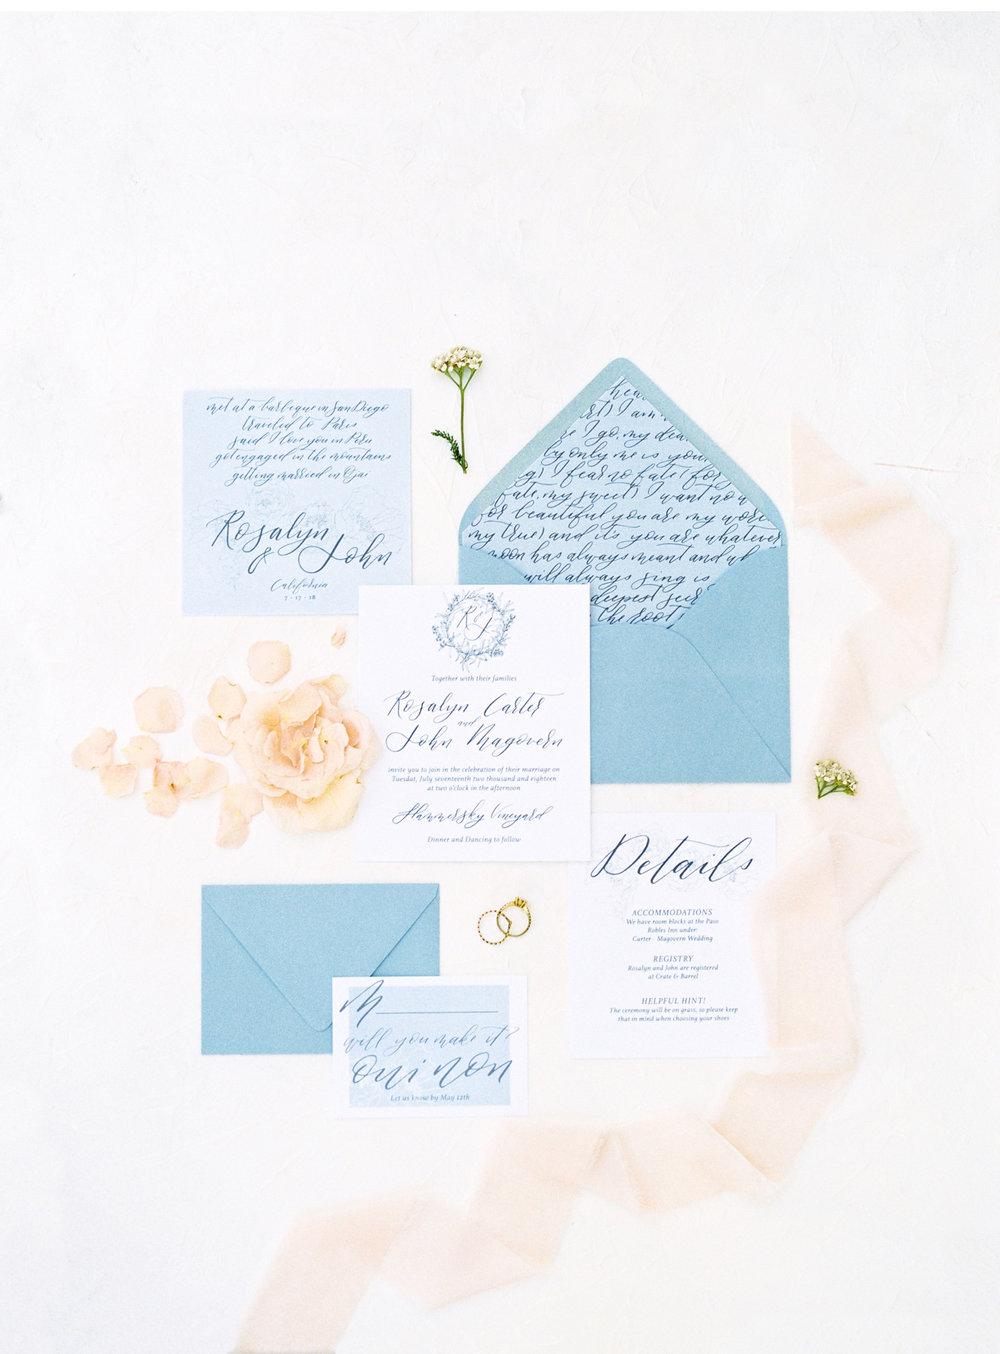 San-Luis-Obispo-Weddings-Natalie-Schutt-Wedding-Photography_04.jpg